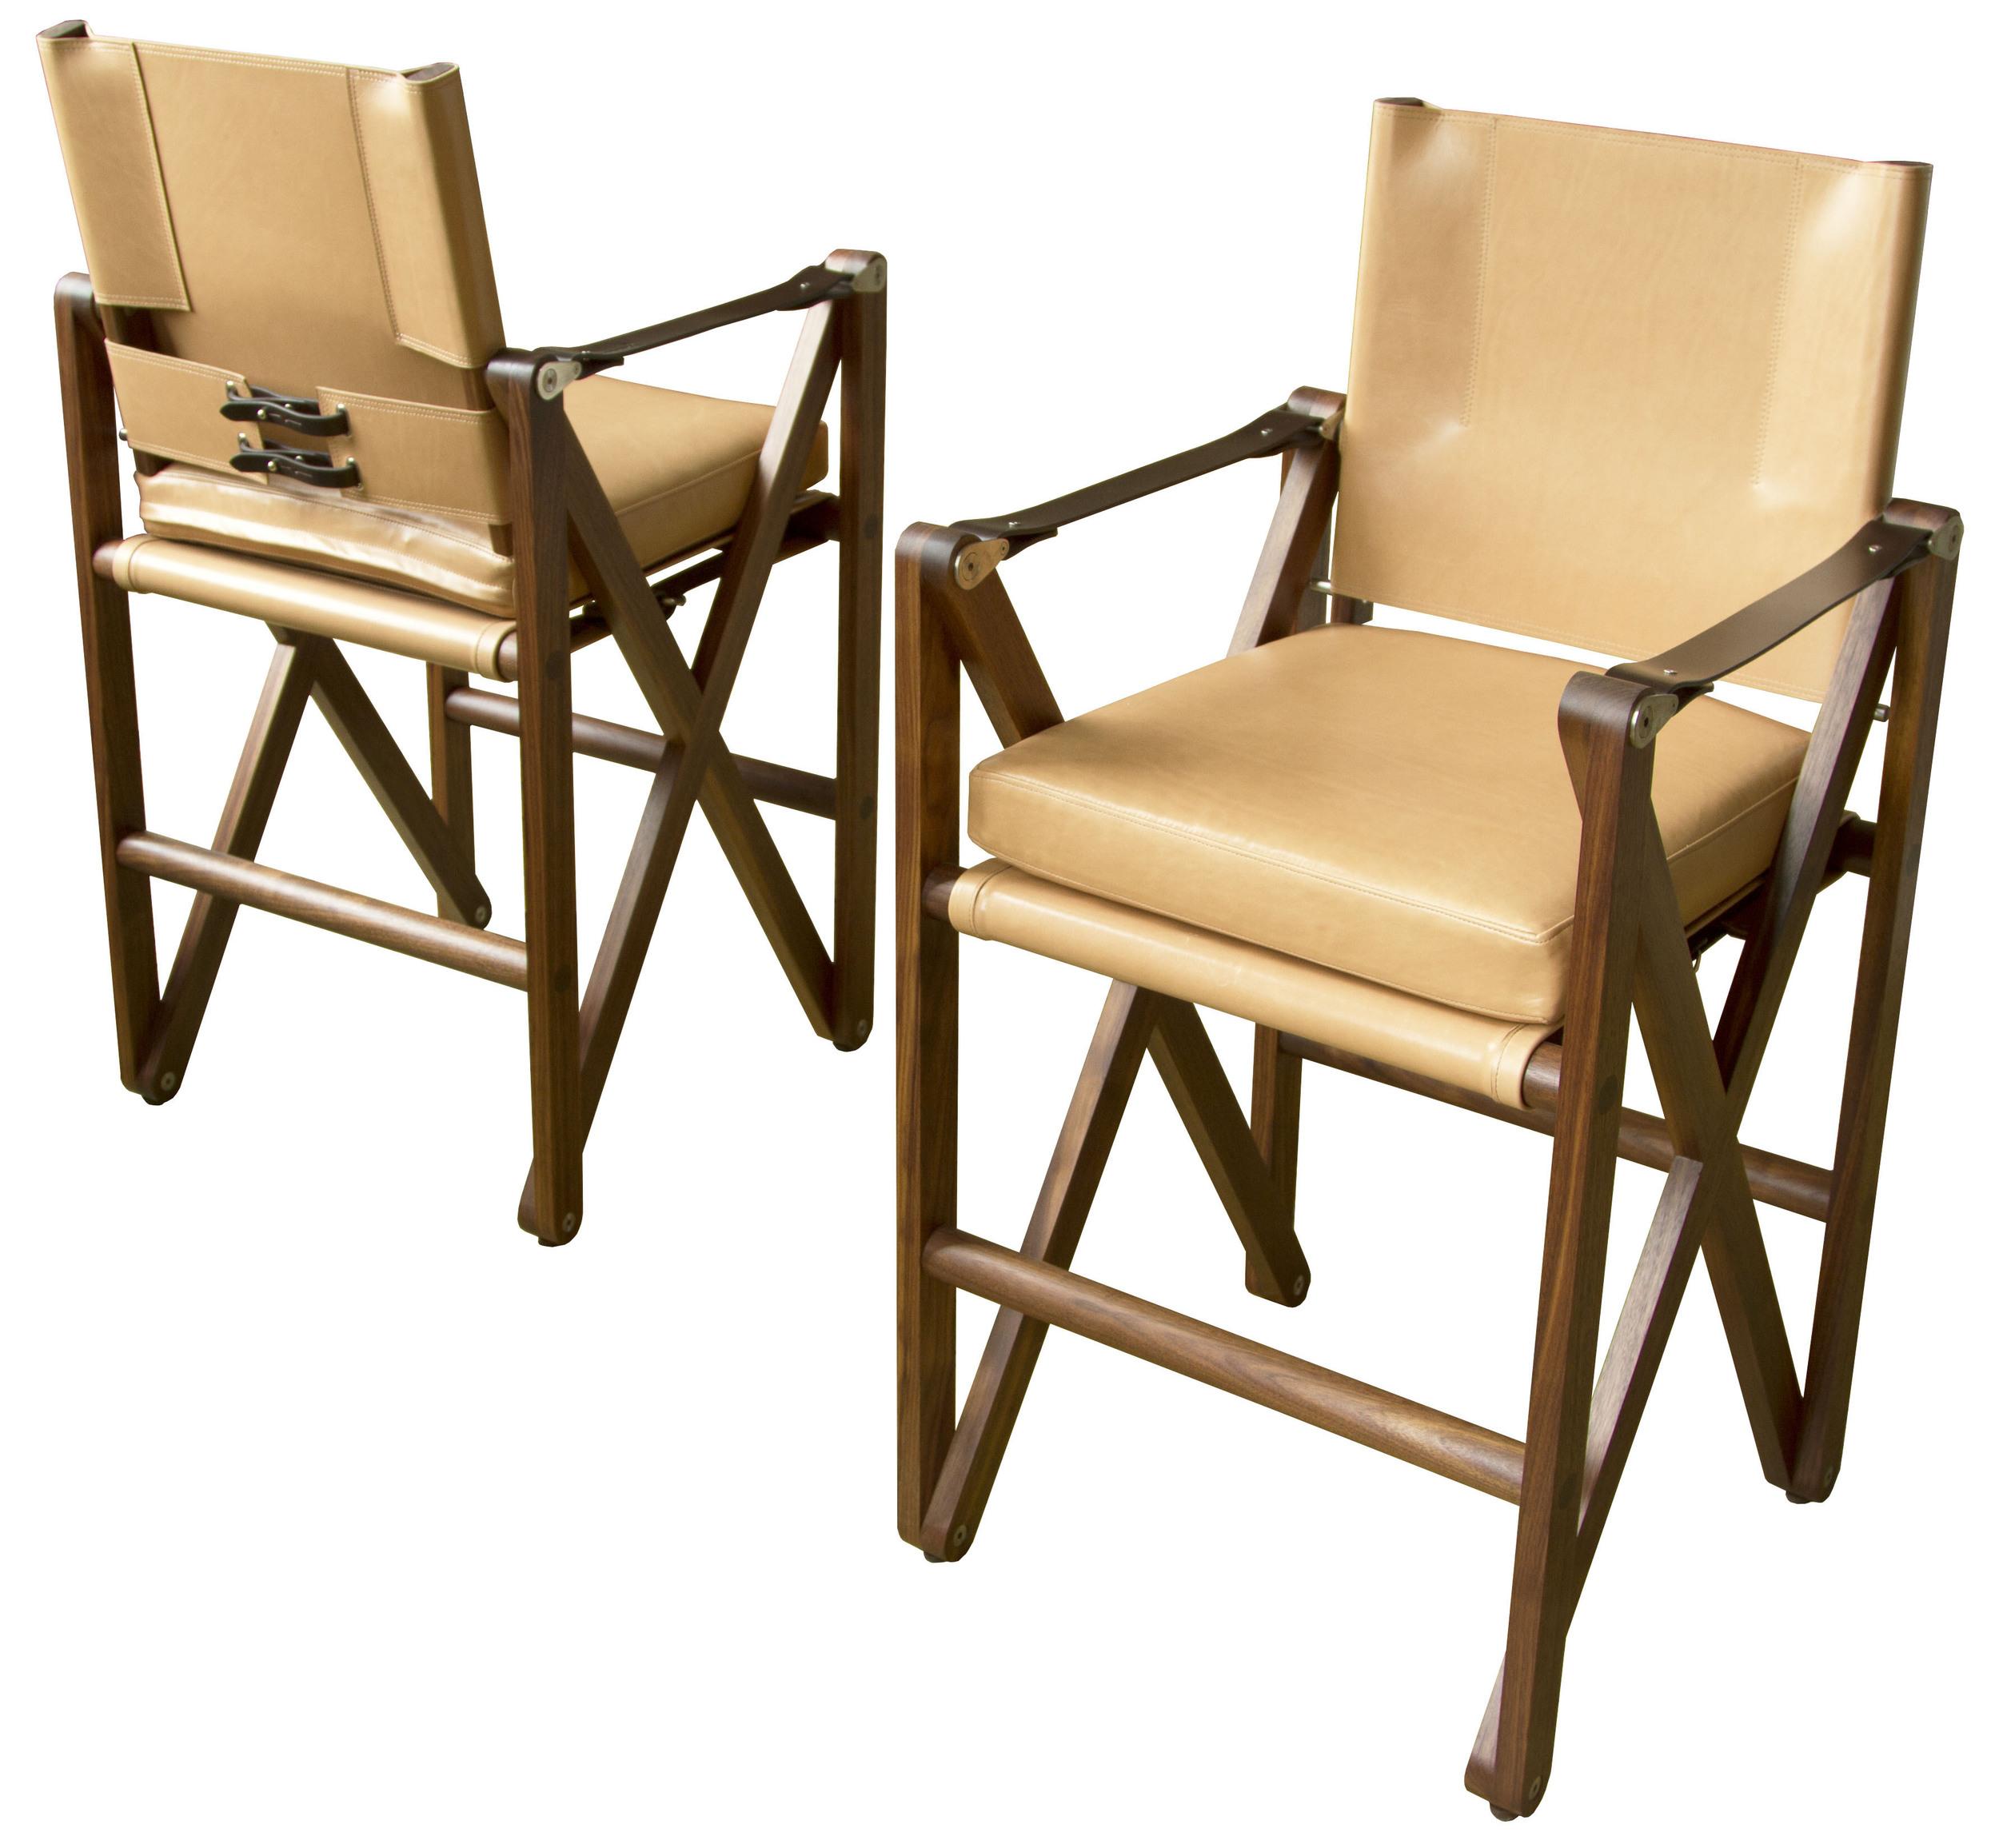 MacLaren Counter Chair - Narrow